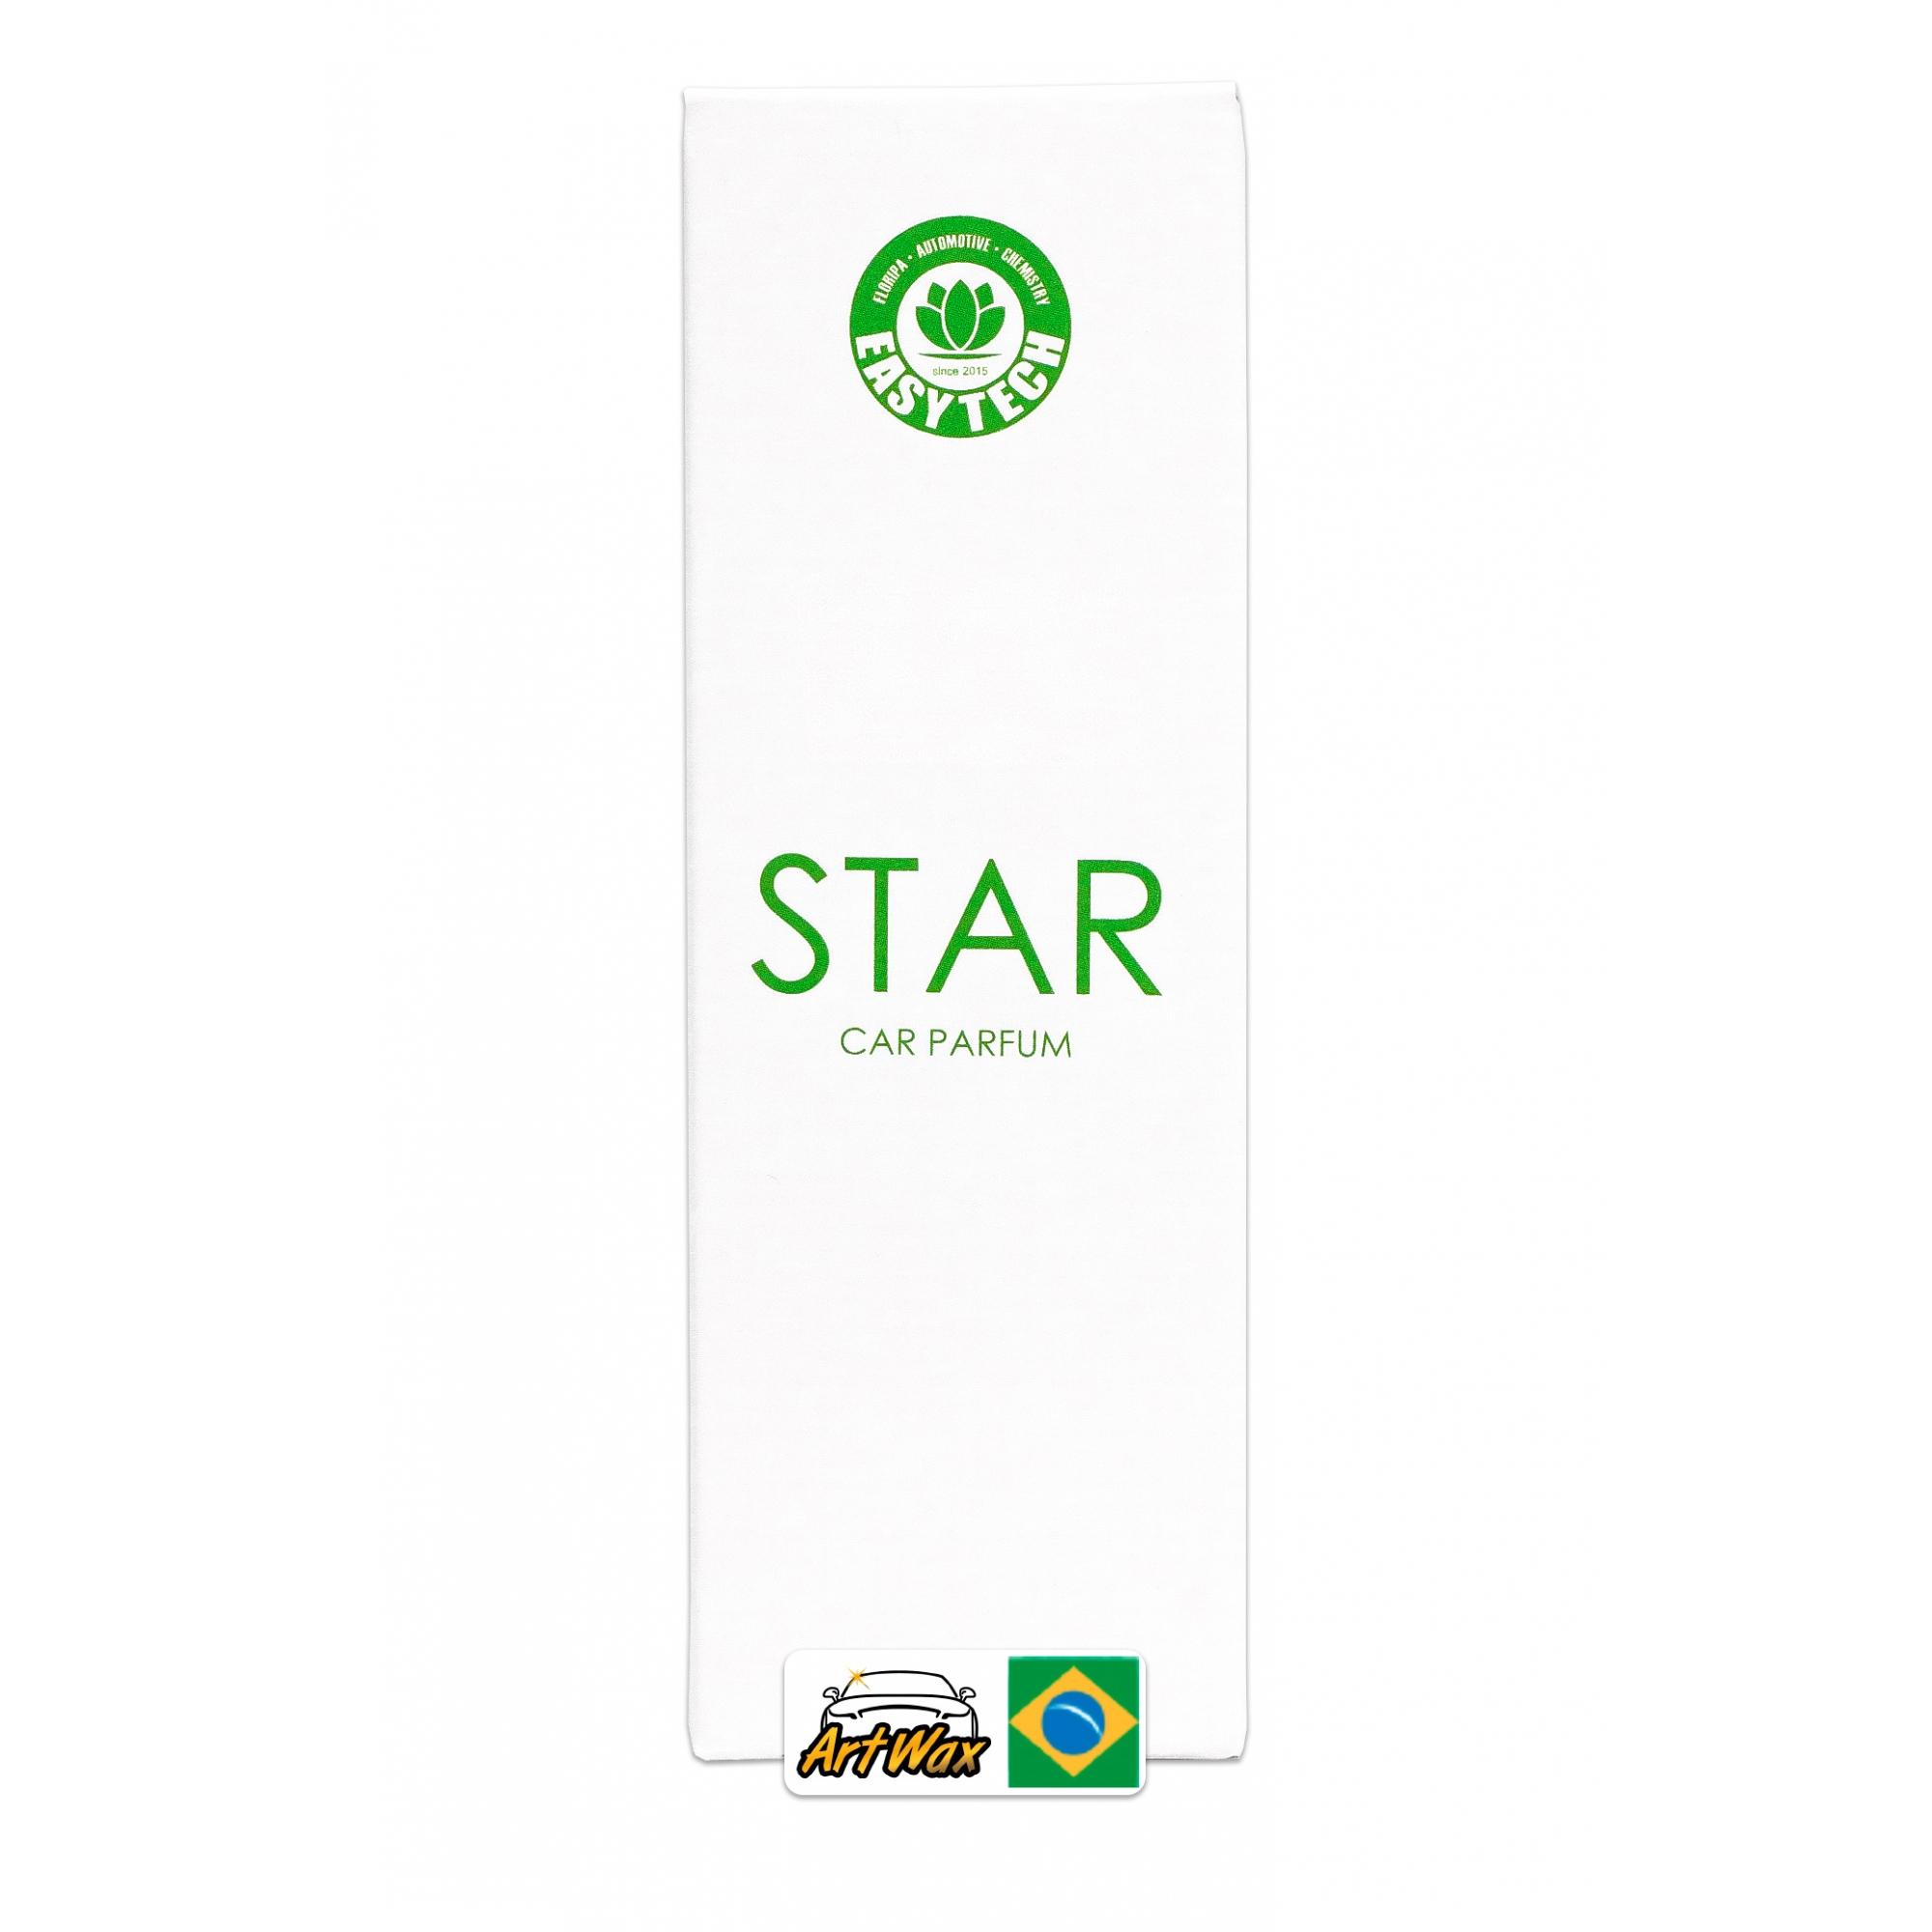 Easytech Star Car Parfum - Aromatizante Spray 50ml